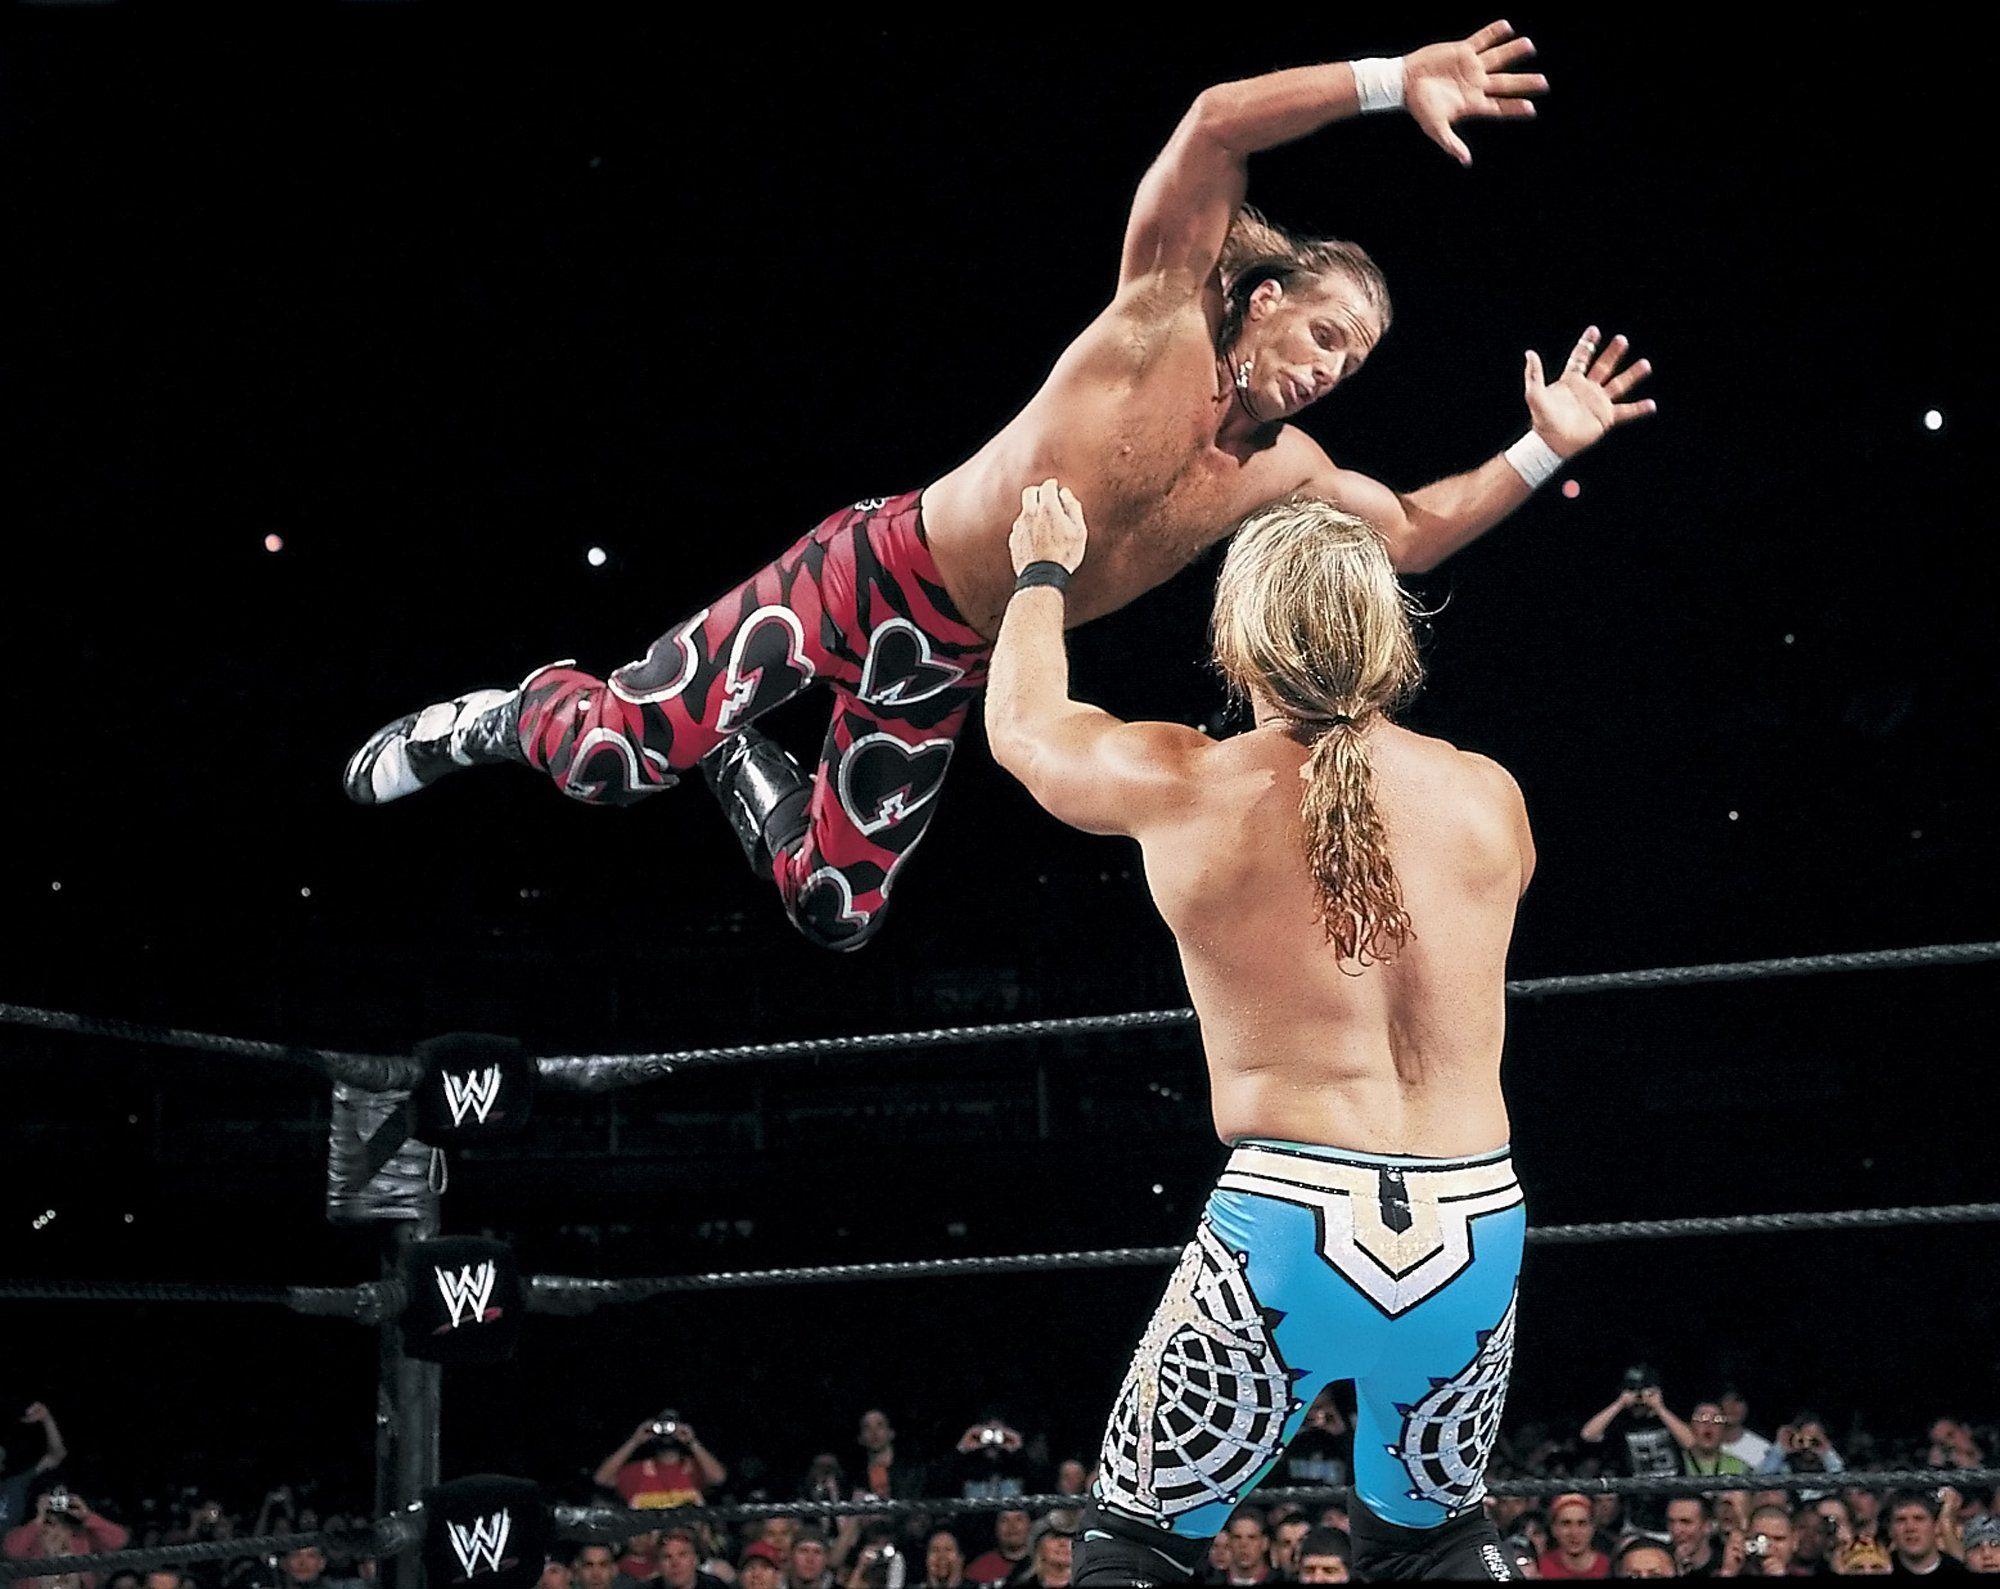 One Of My Favorite Matches Wrestlemania Xix Chris Jericho Vs